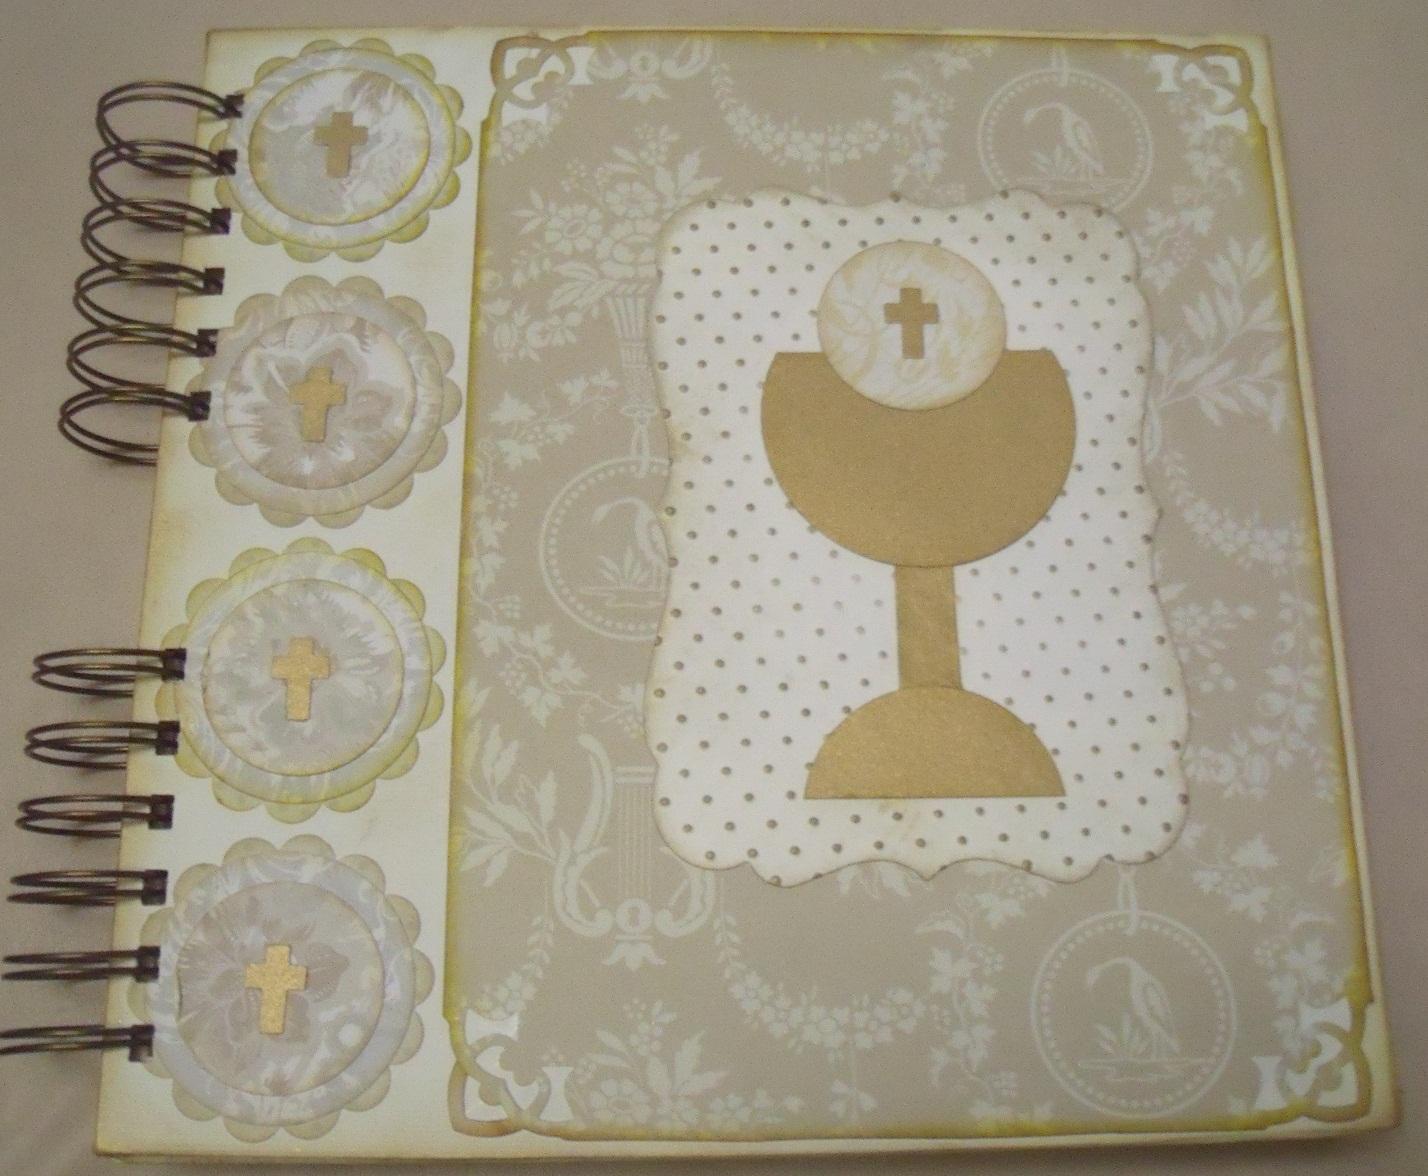 Arte krusay scrapbook album primera comunion - Como hacer tarjetas para comunion ...